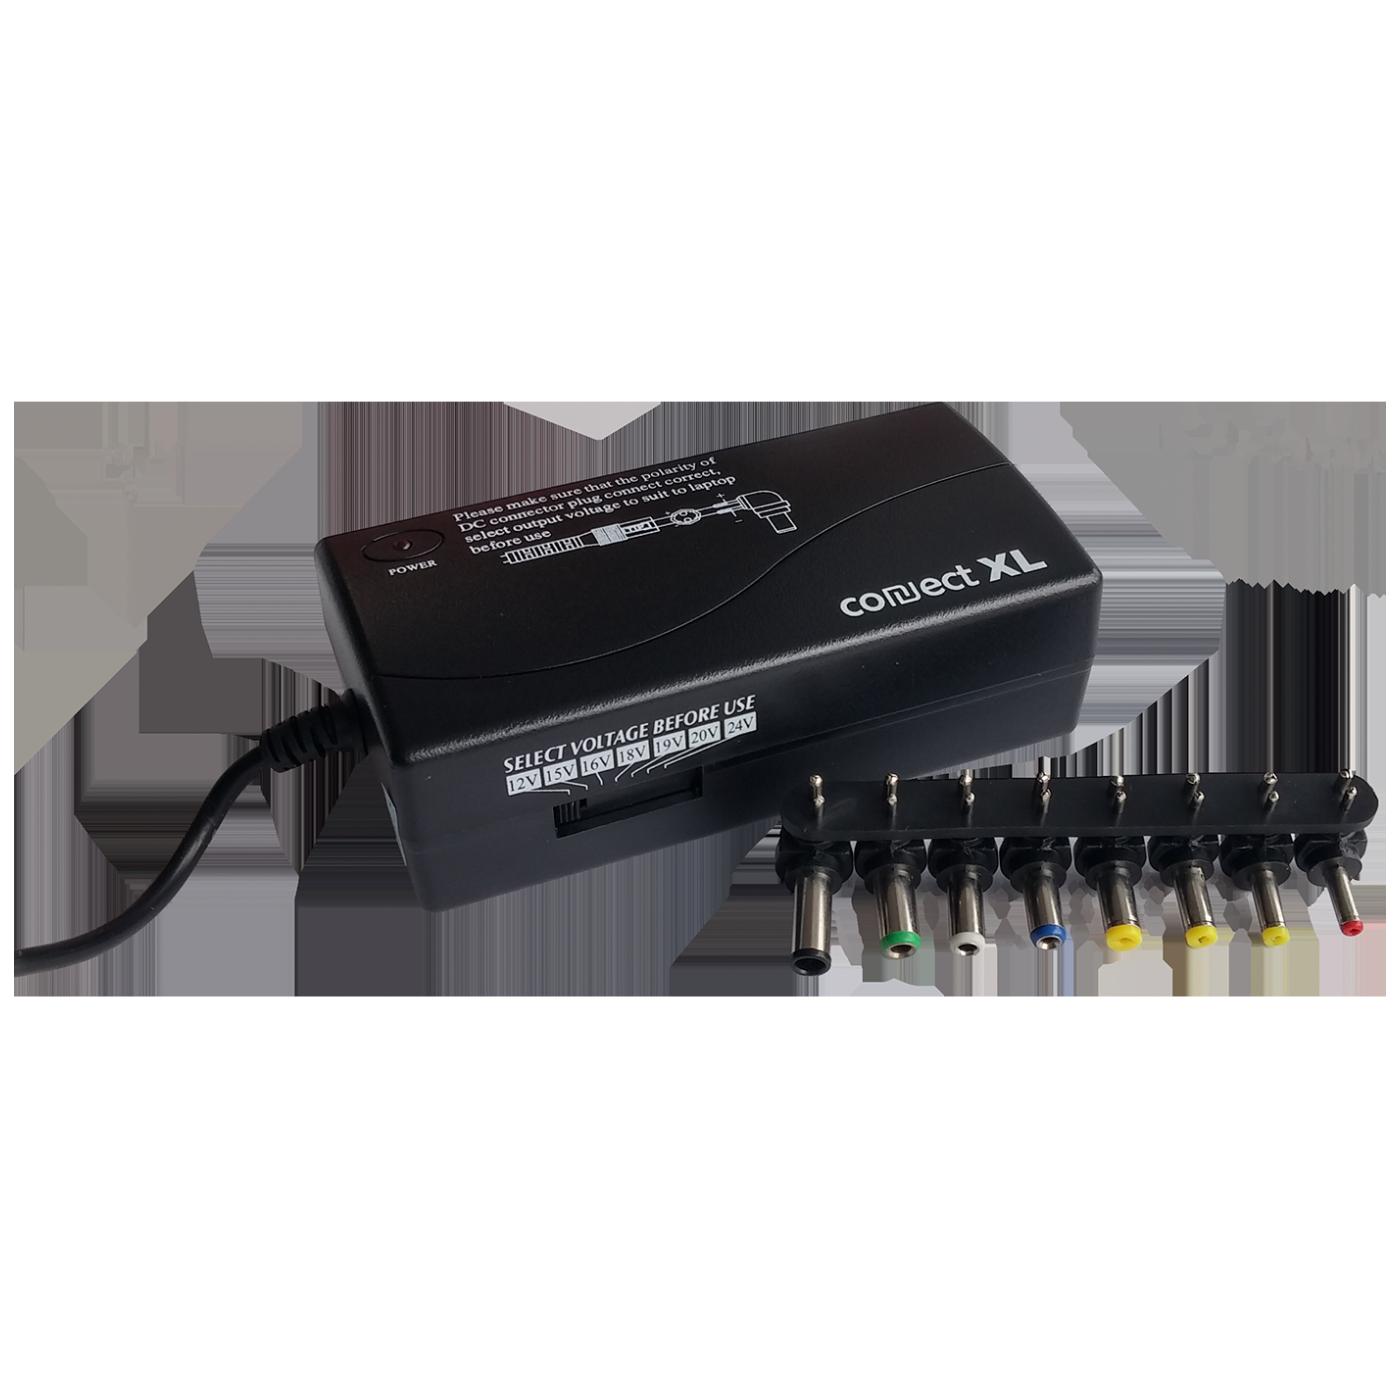 Adapter za laptop, univerzalni, 70W, 100VA, 8 priključaka